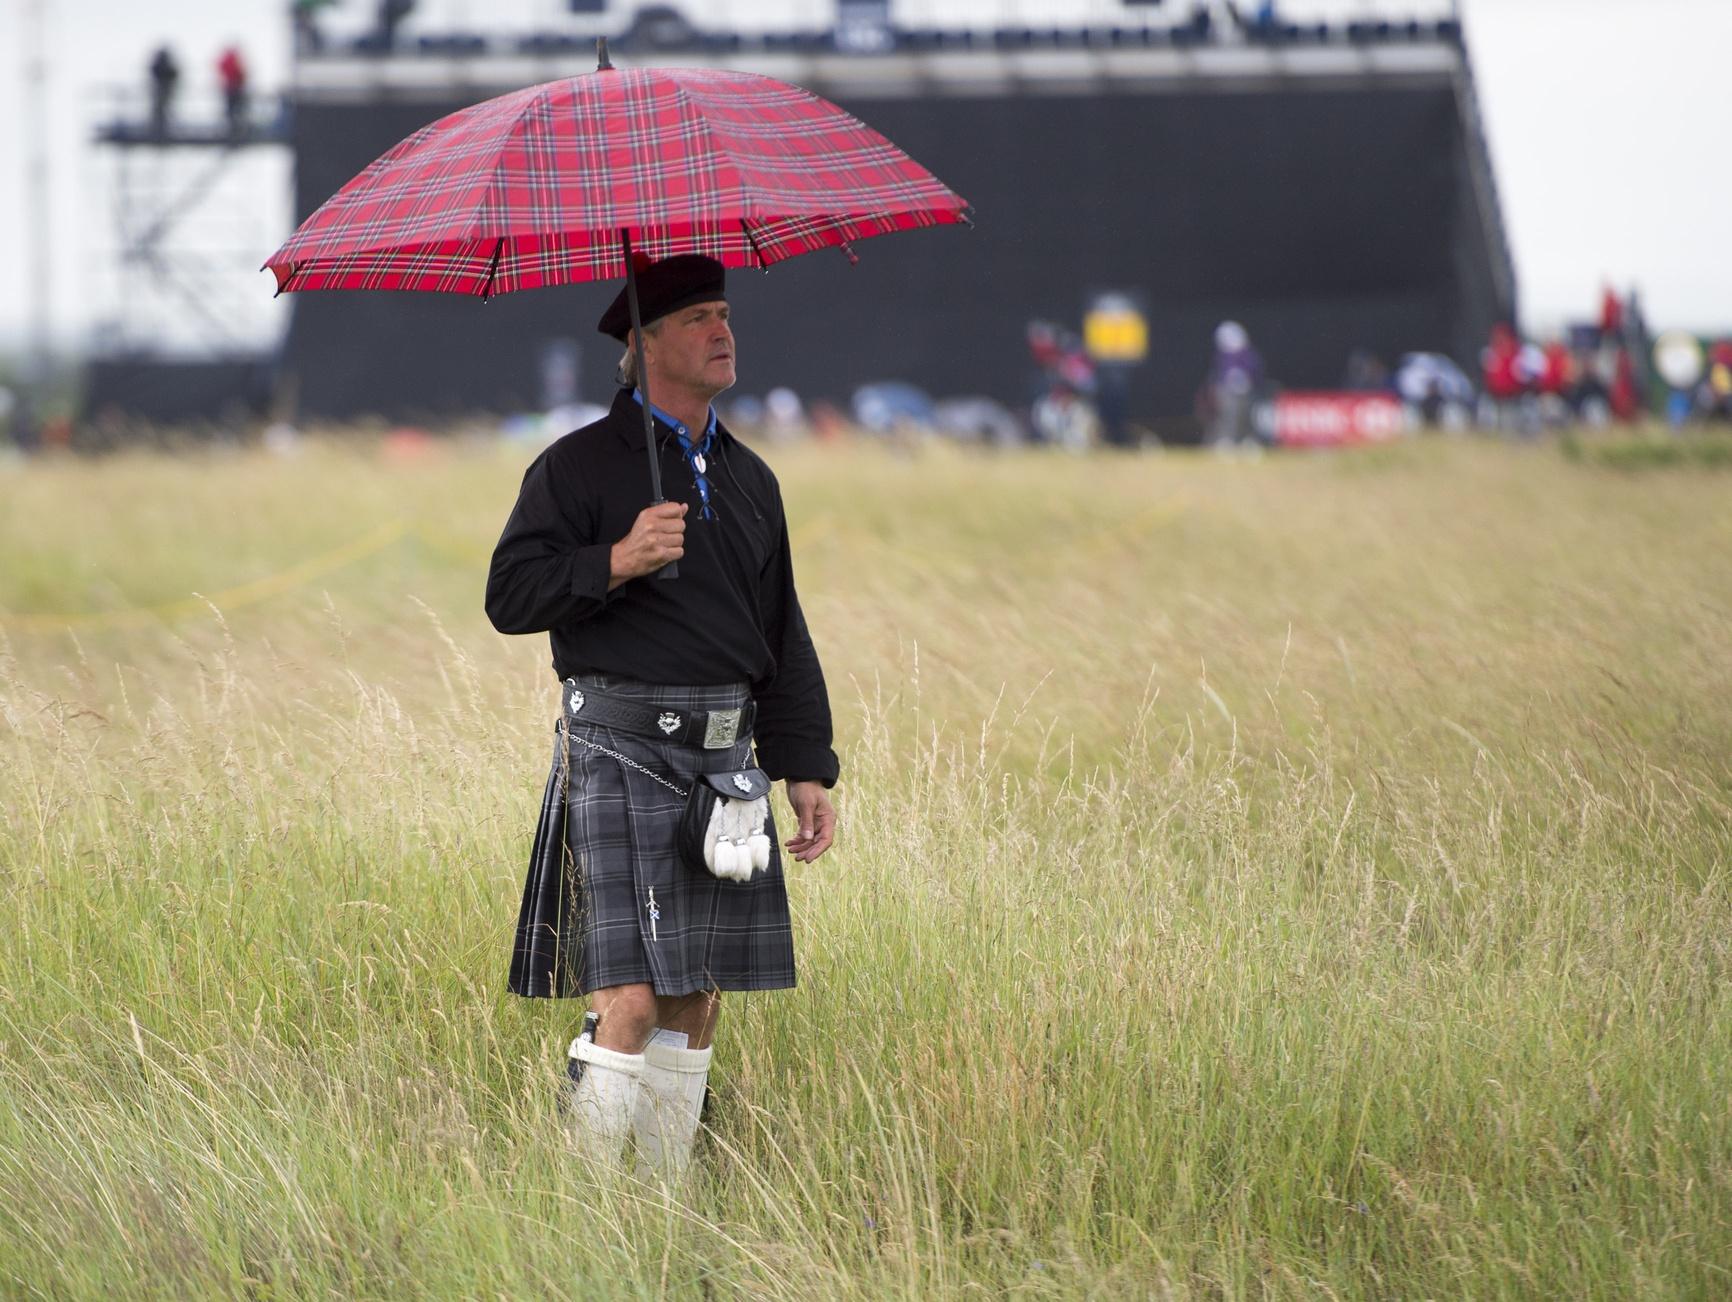 2016 British Open, Royal Troon